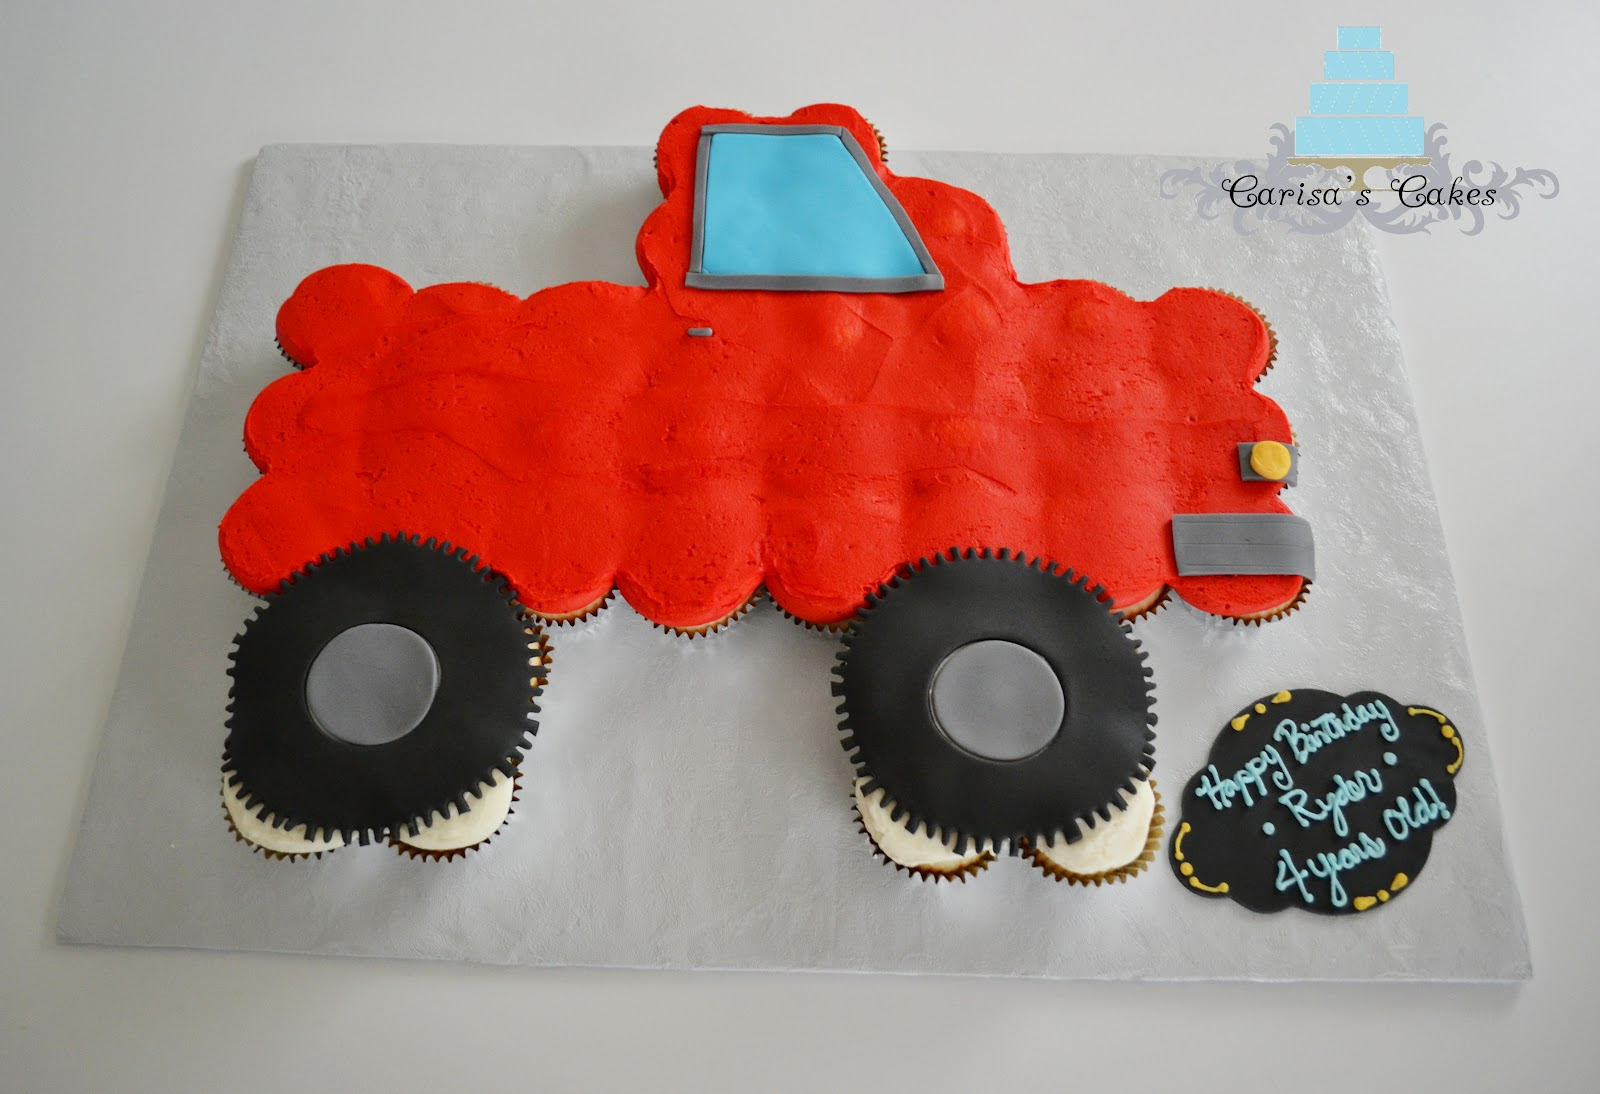 Pin Spiderman Pull Apart Cupcakes Cupcake Cakes Cake On